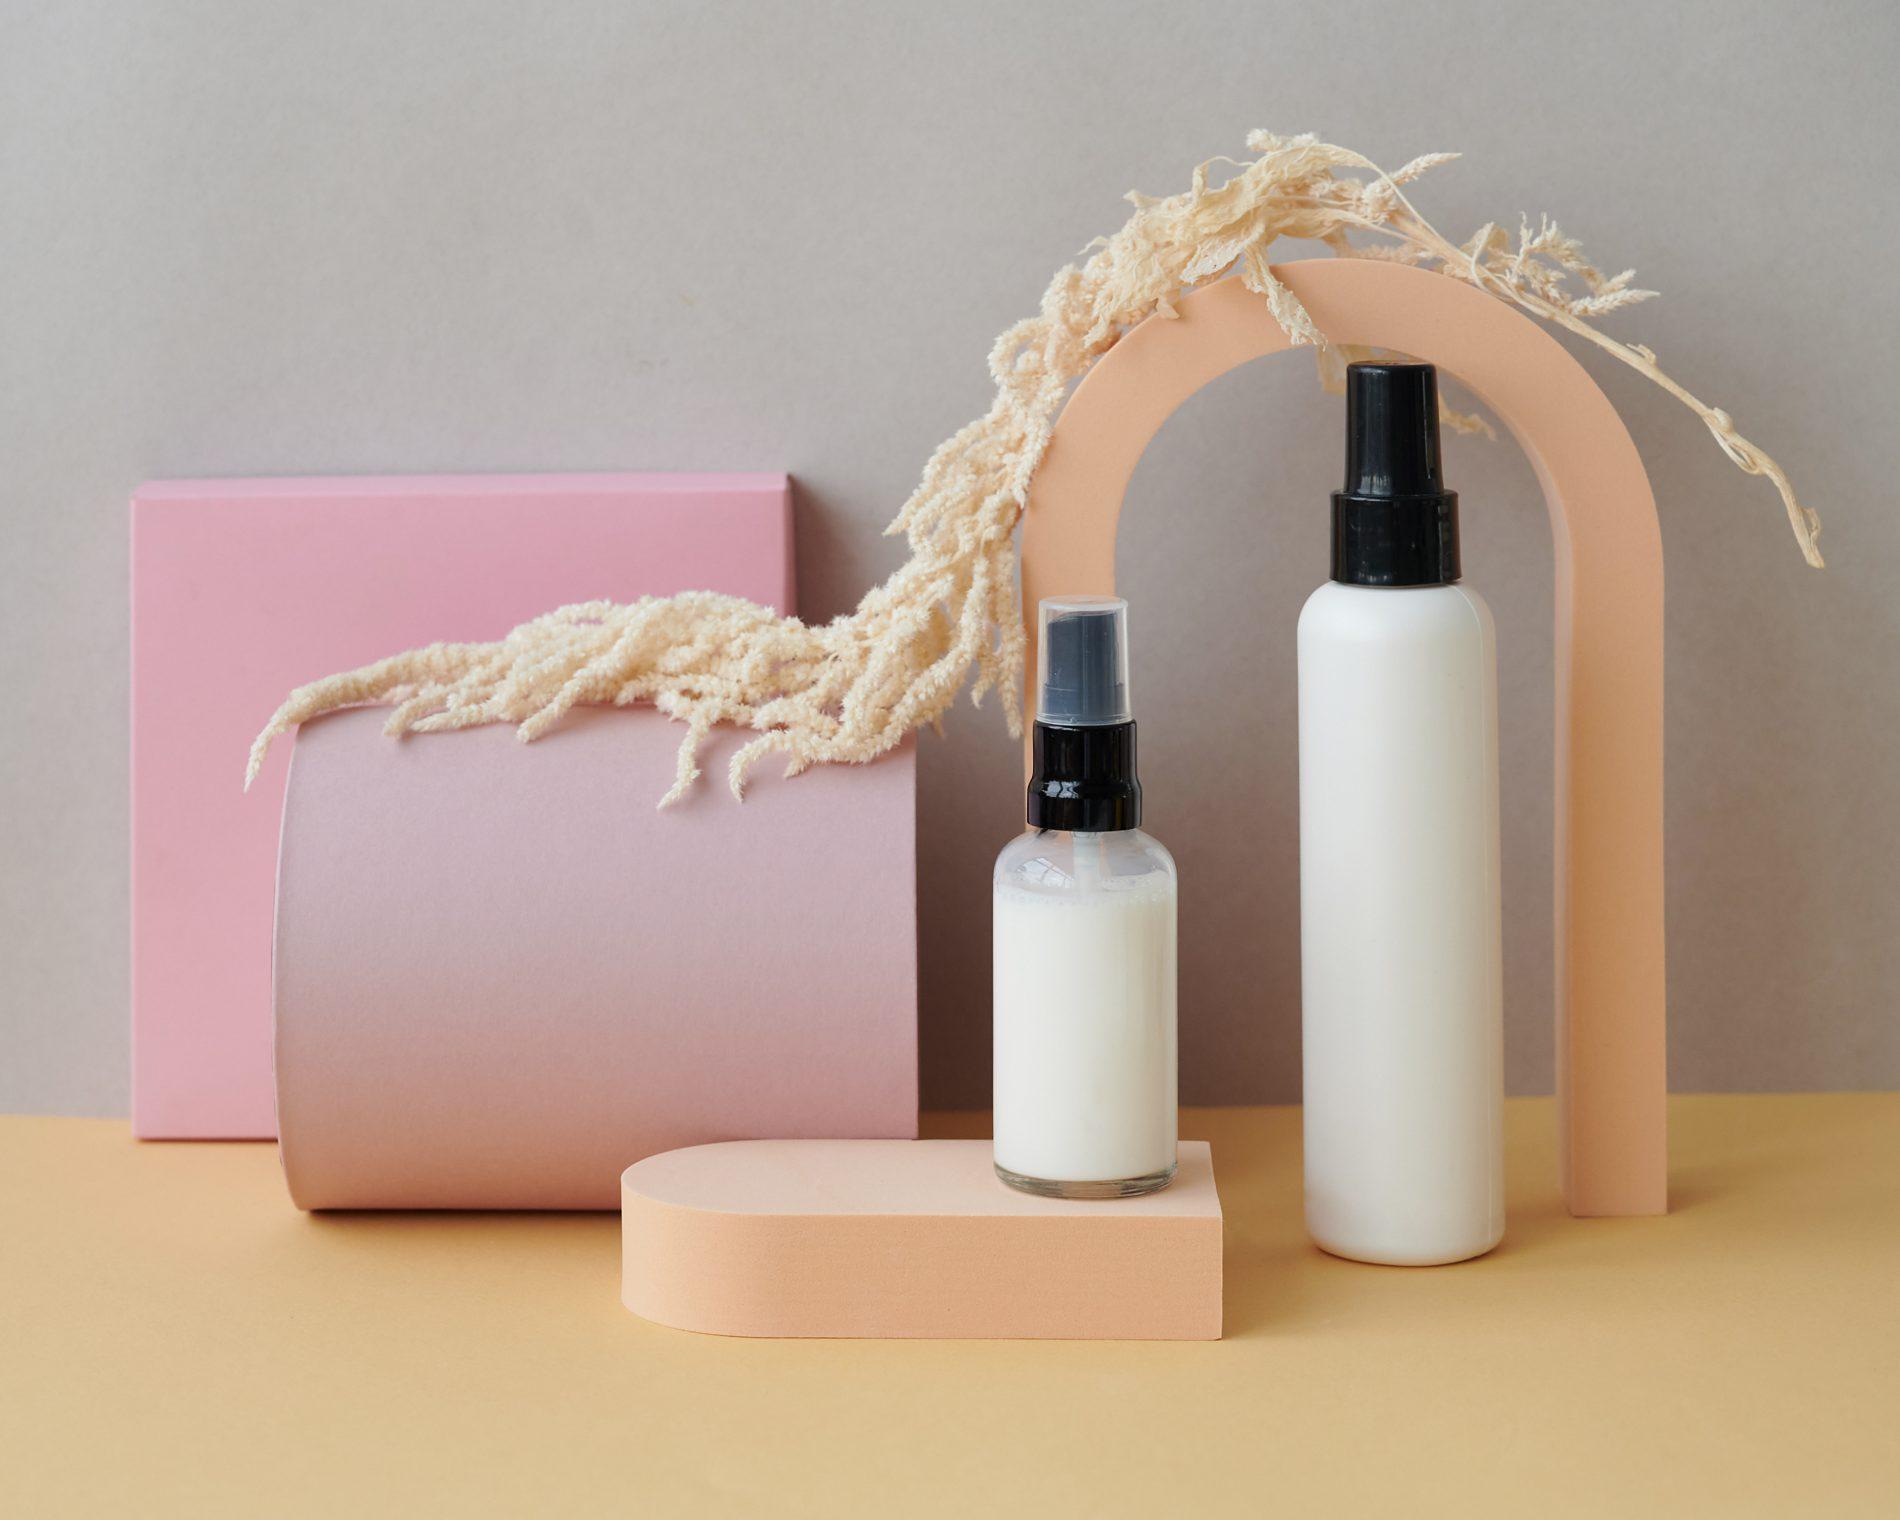 Fashion relaxation luxury soap